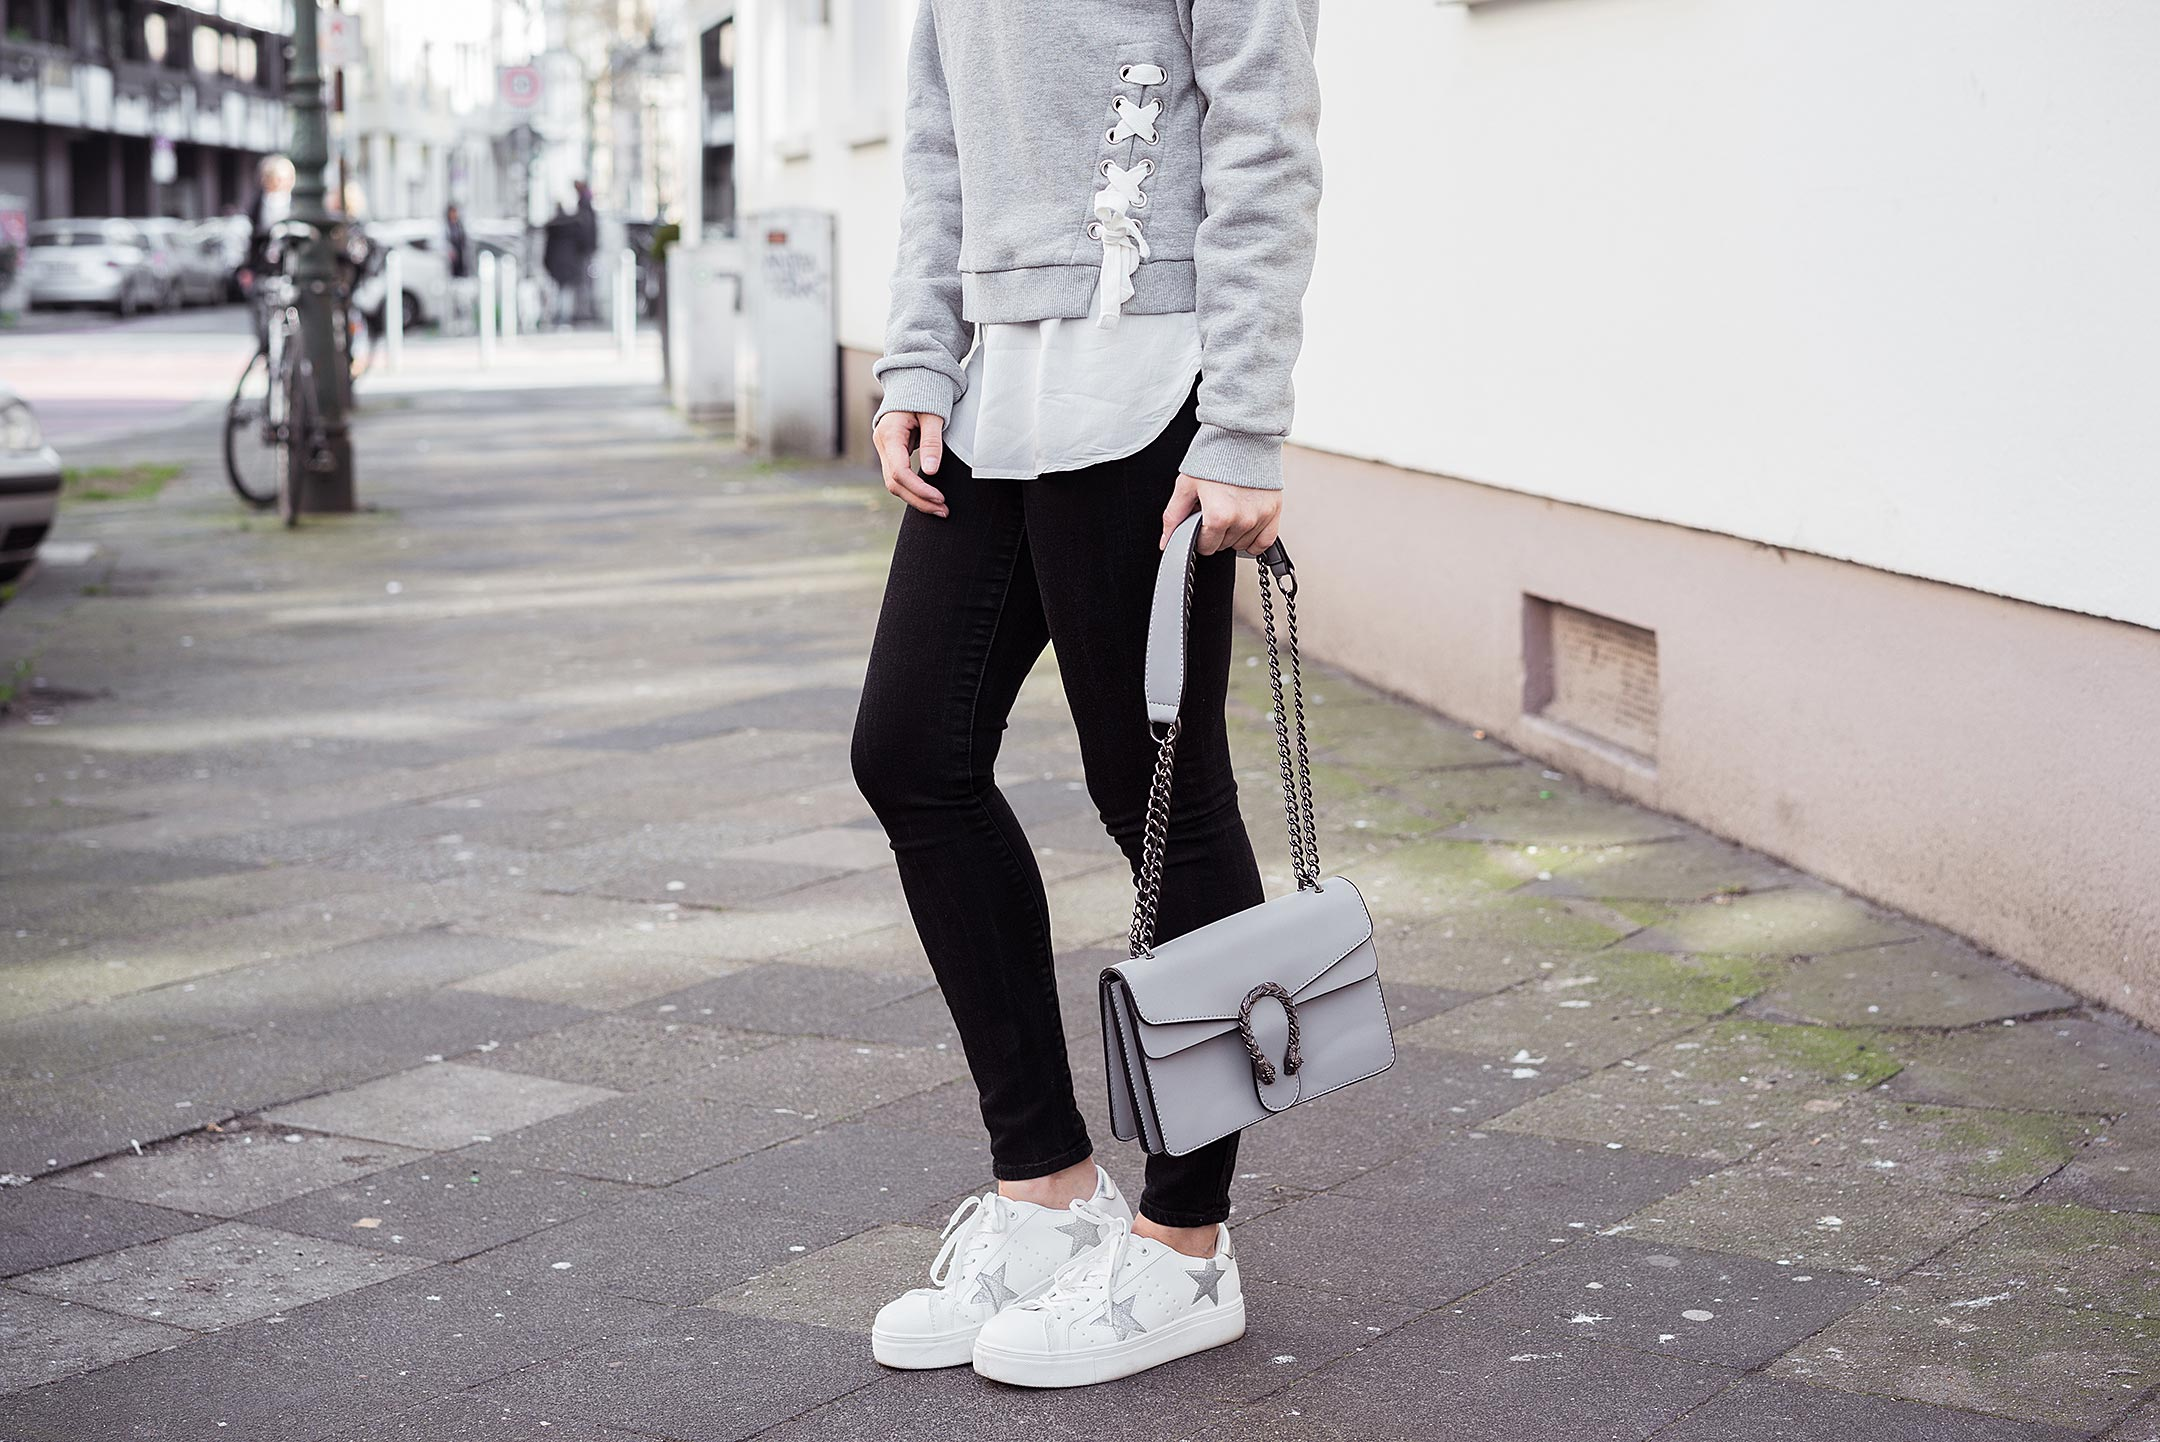 Sternchen Sneaker weiß silber Sunnyinga Schuhe Modeblog